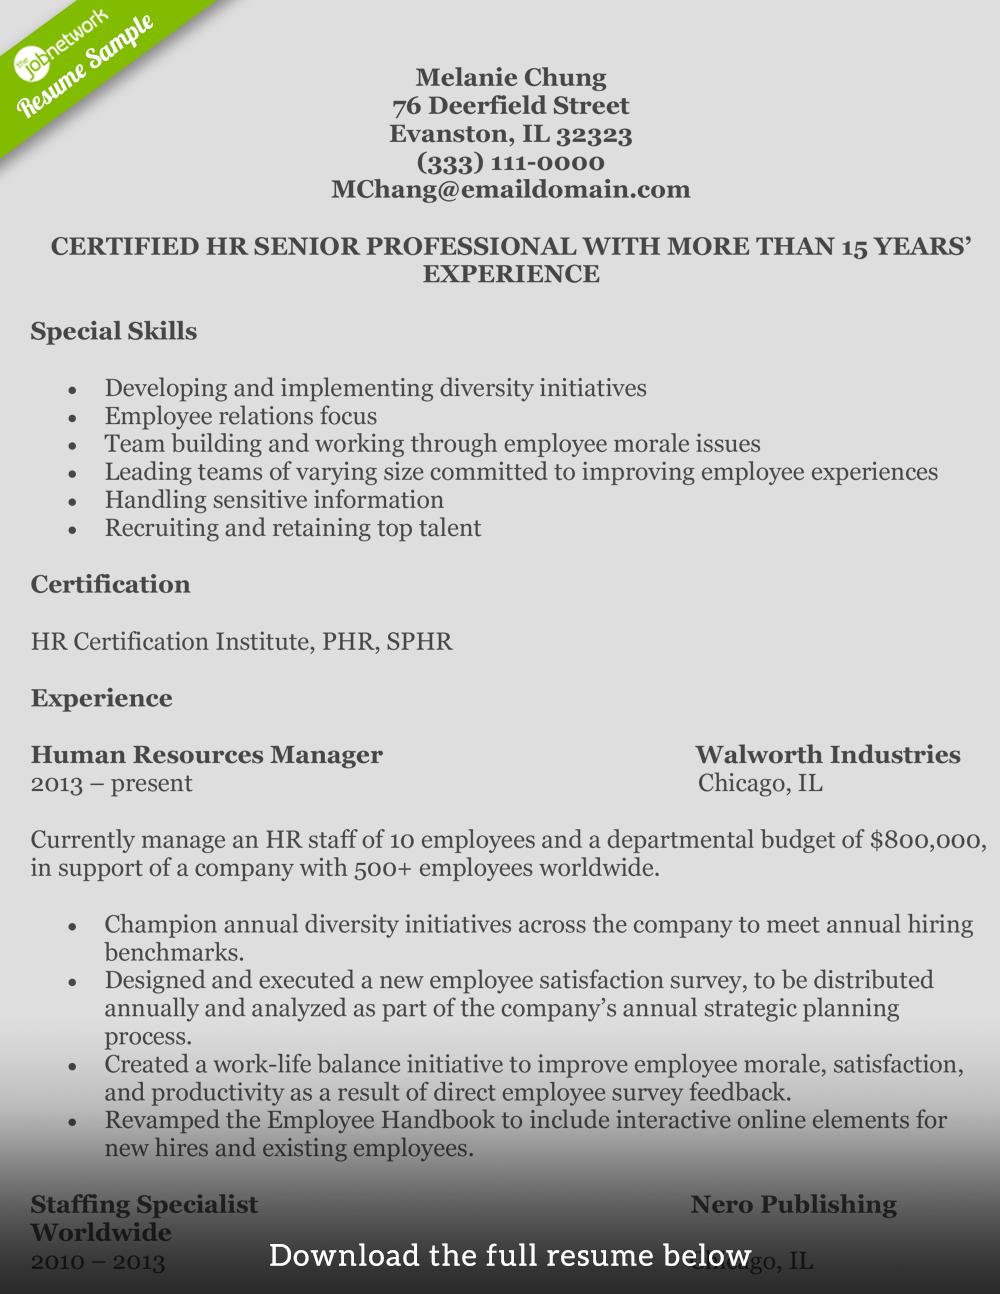 human-resources-resume-melanie